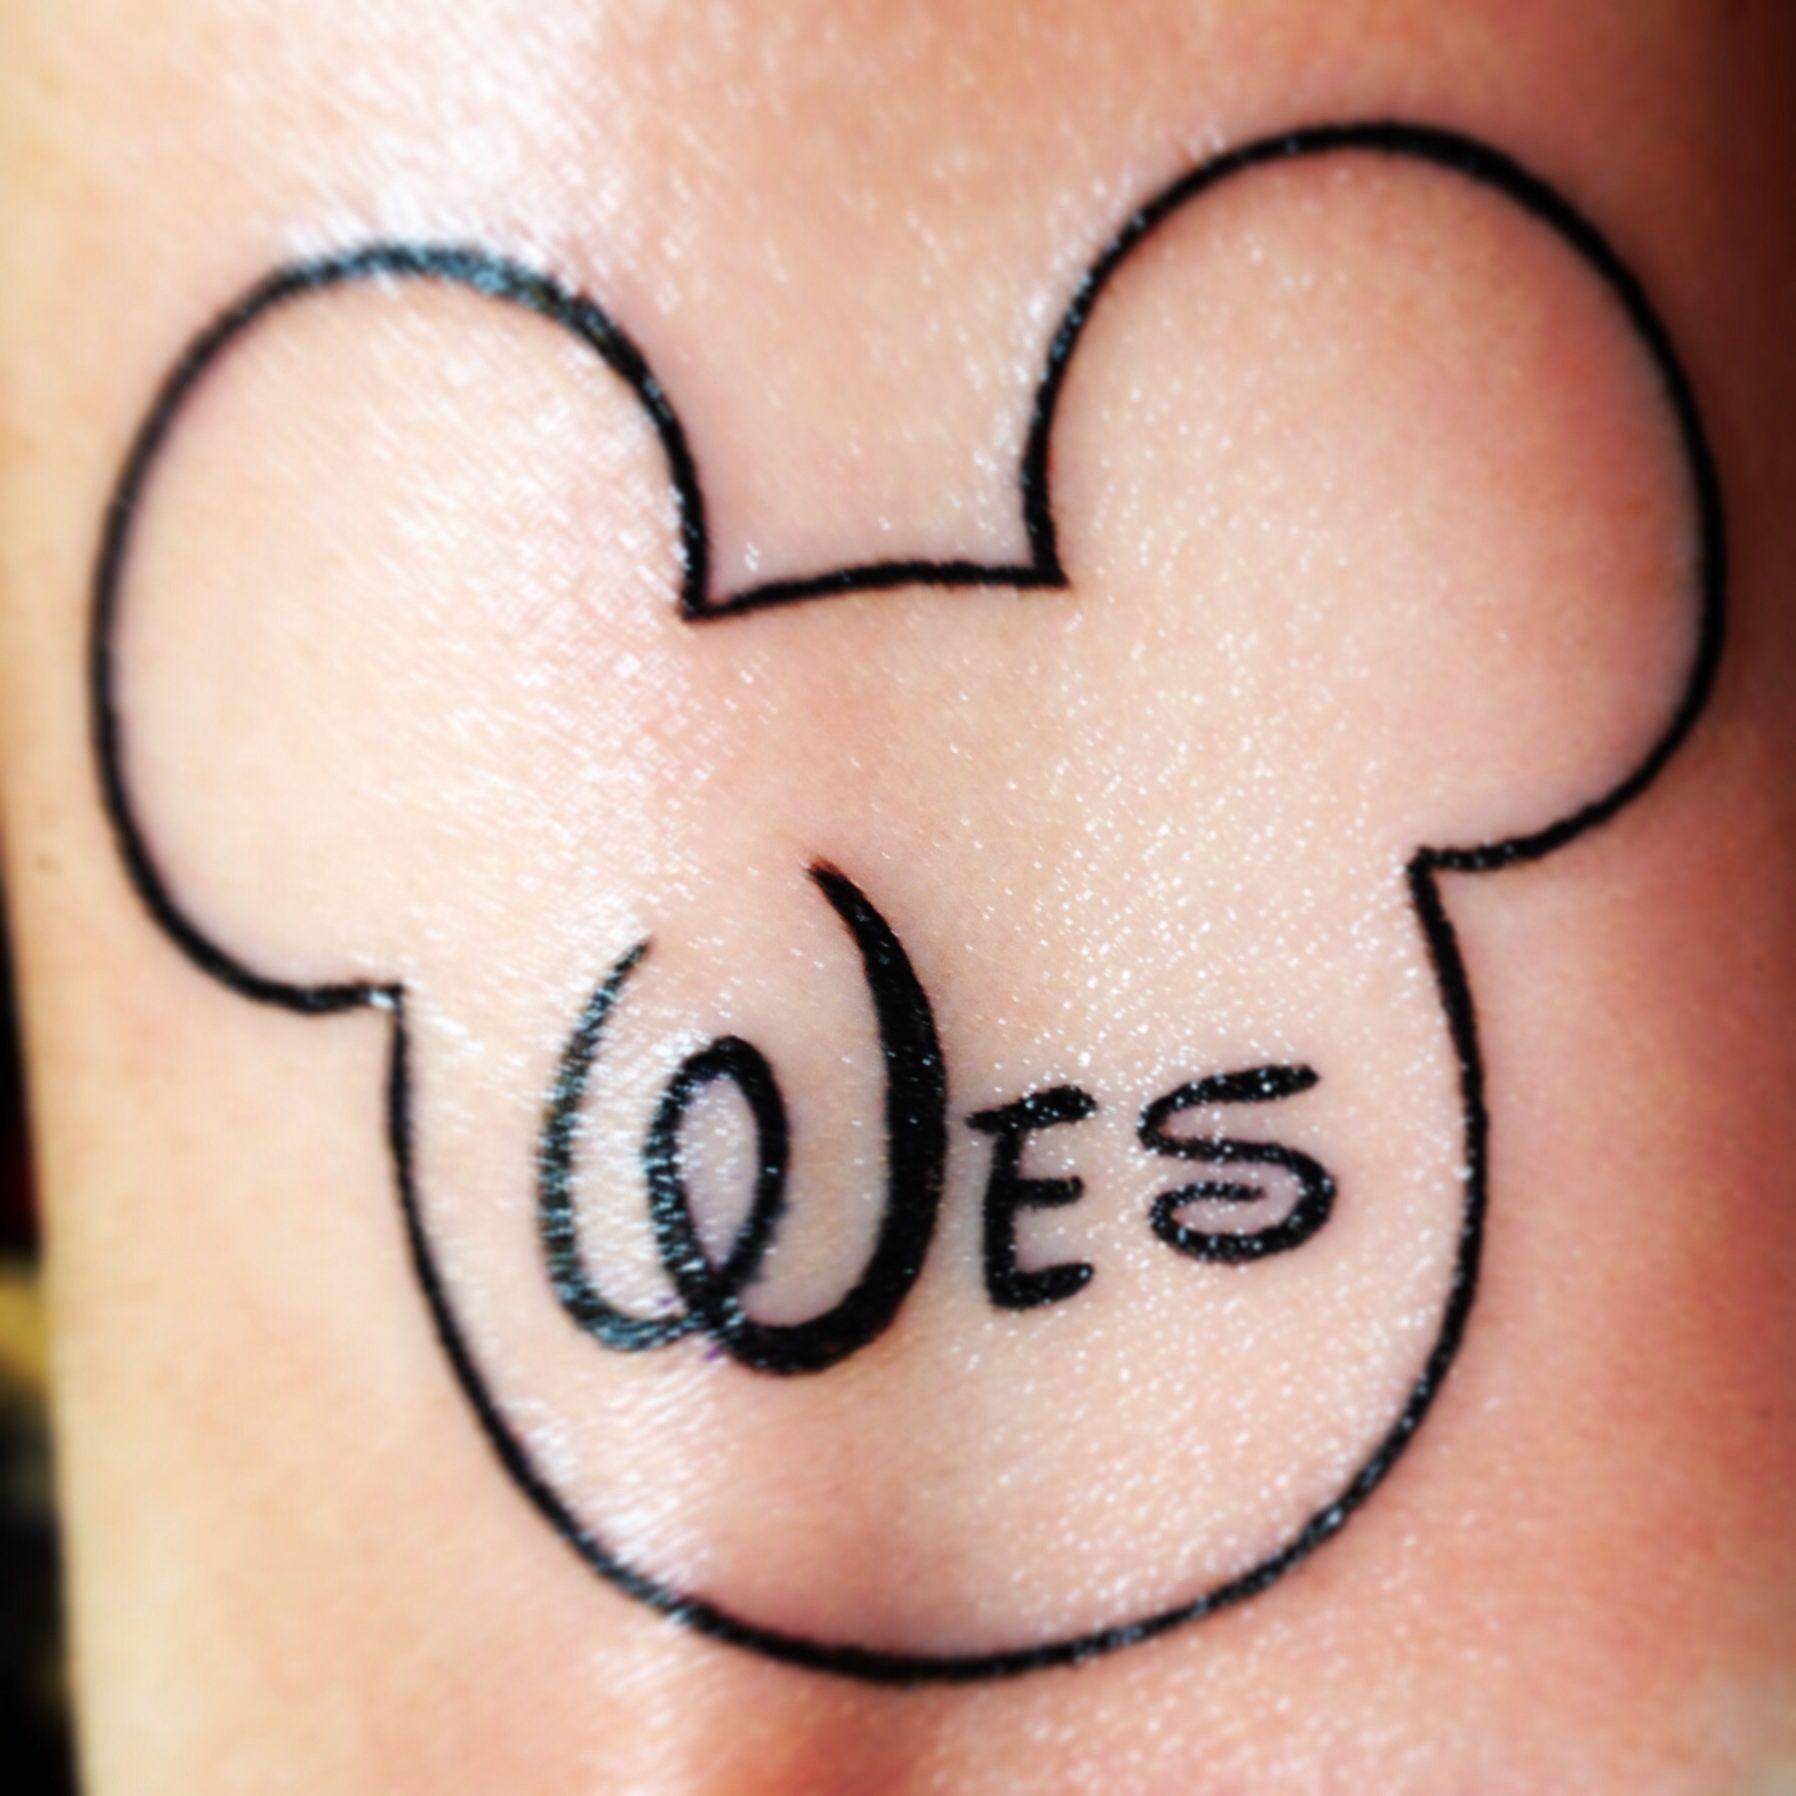 Tattoo for my Disney loving husband